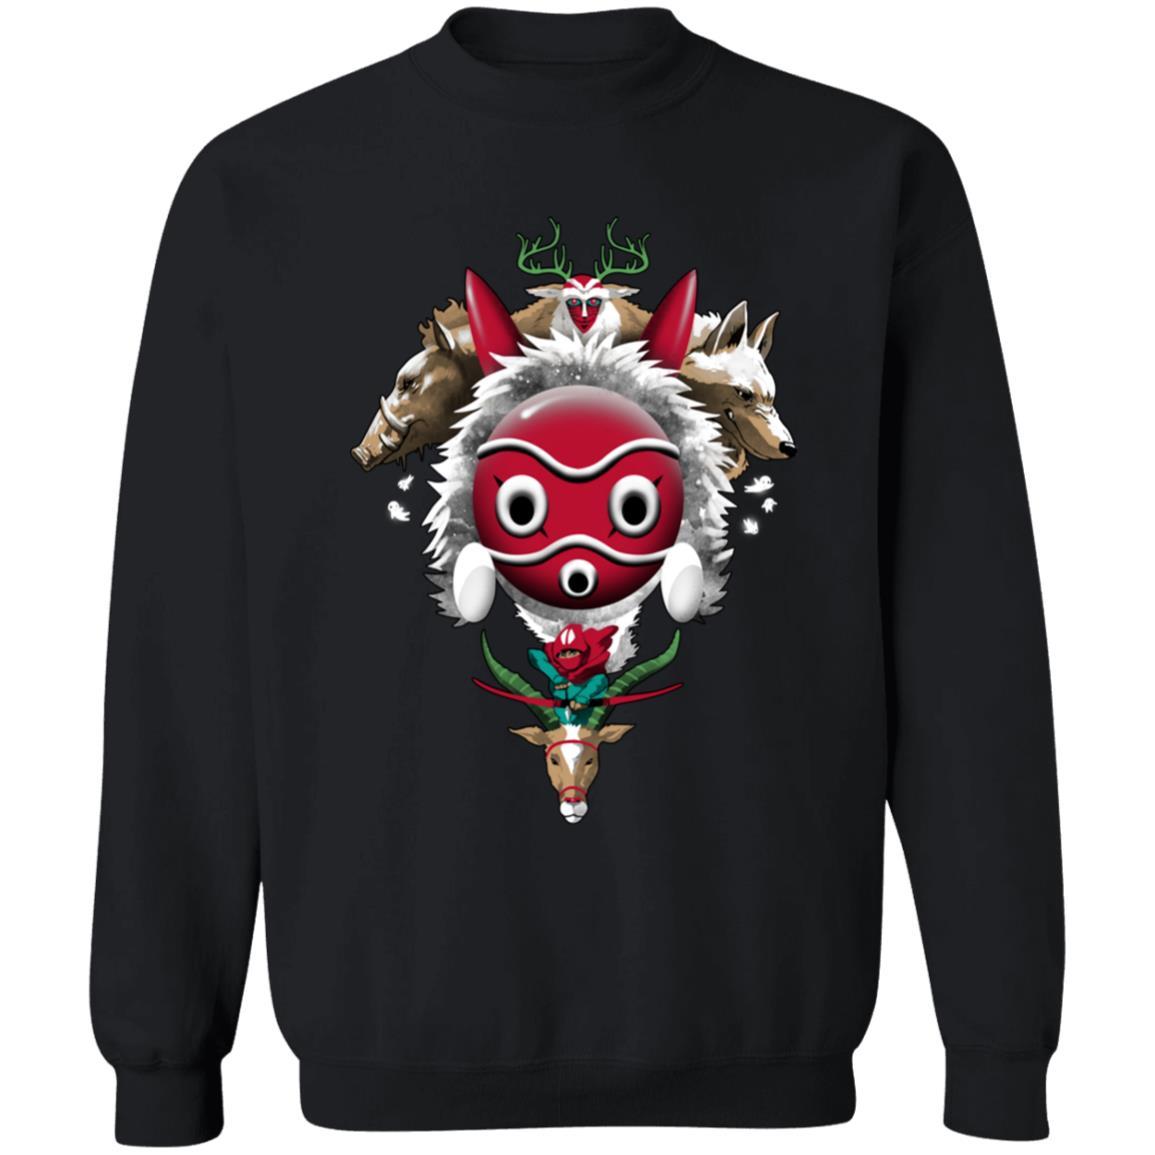 Princess Mononoke – The Forest Protectors Sweatshirt